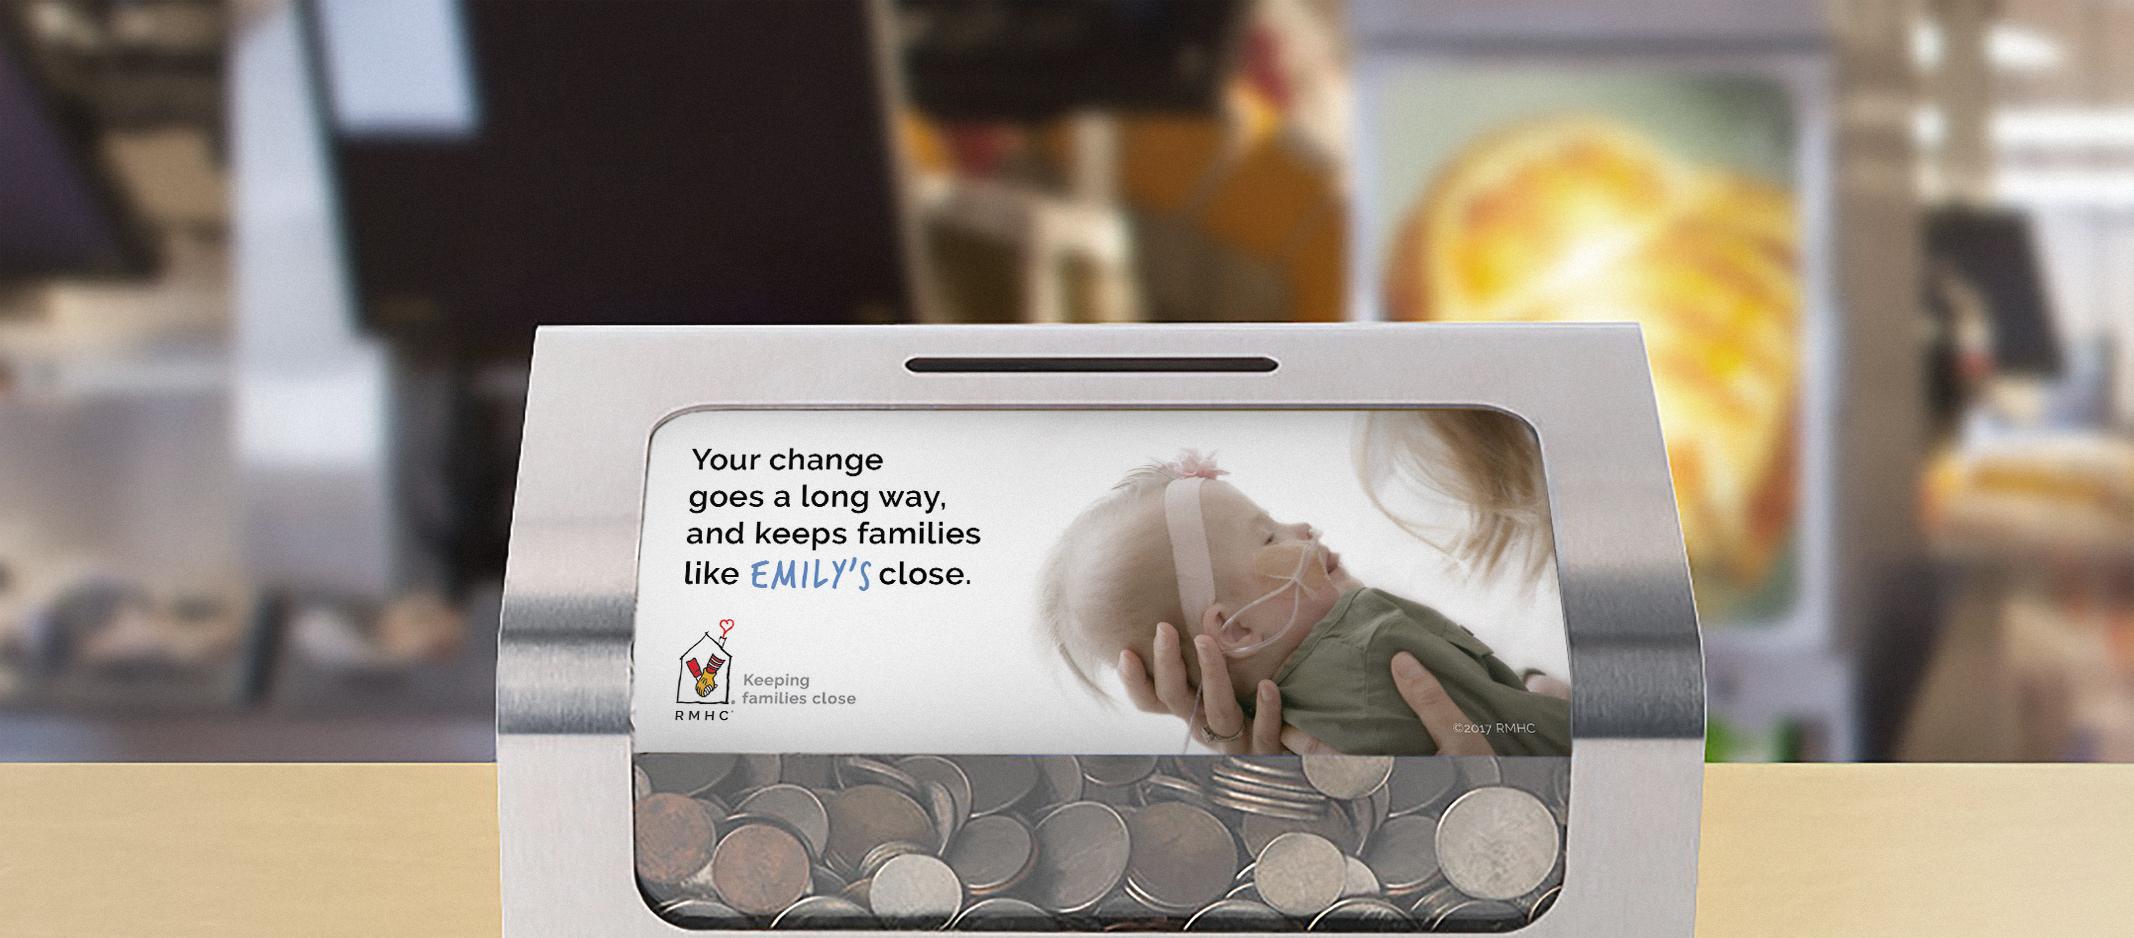 donationbox-emily.jpg